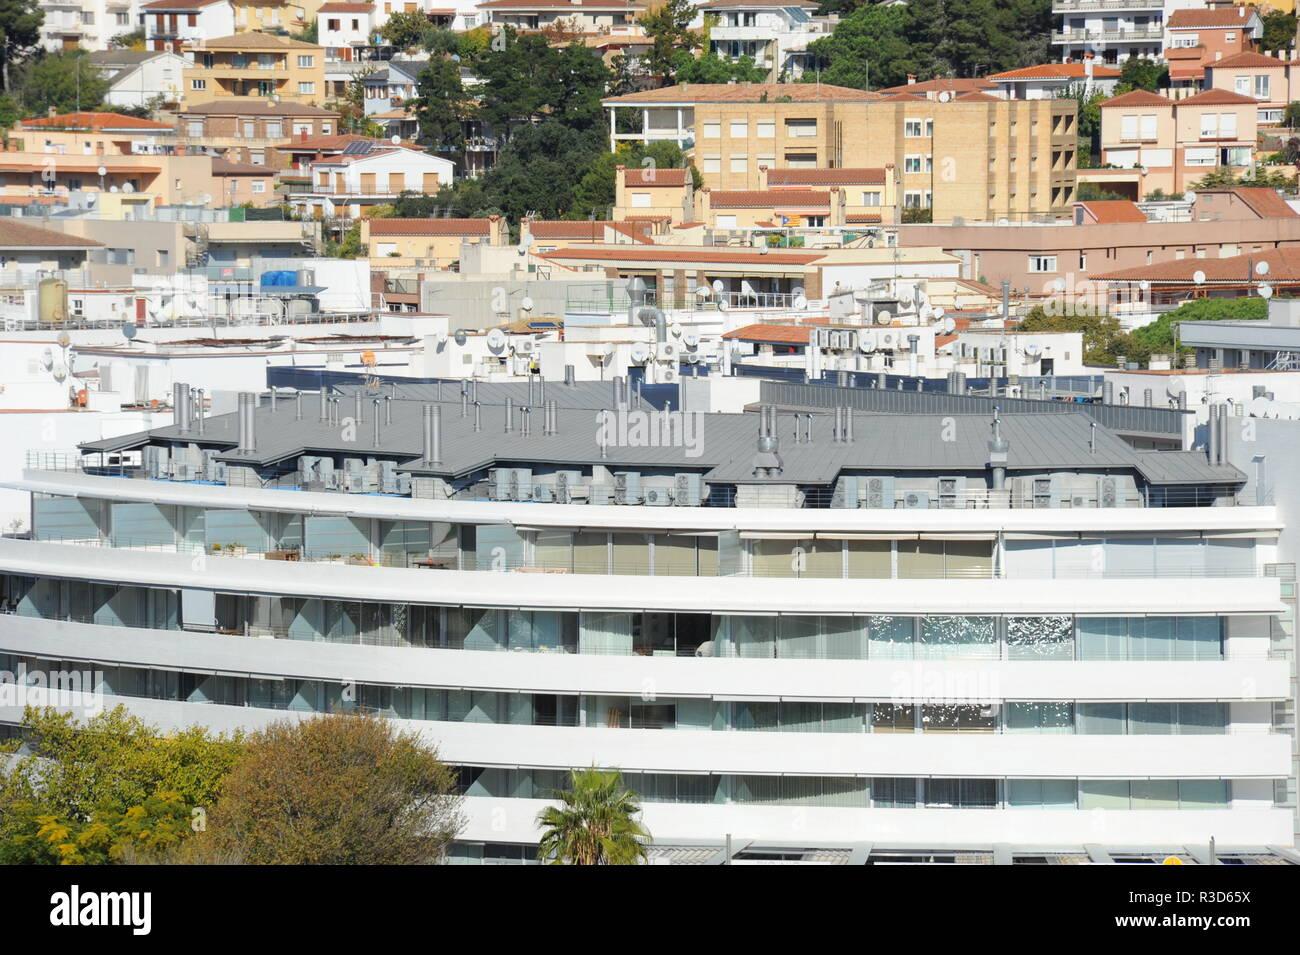 facades in tossa de mar - costa brava - spain - Stock Image